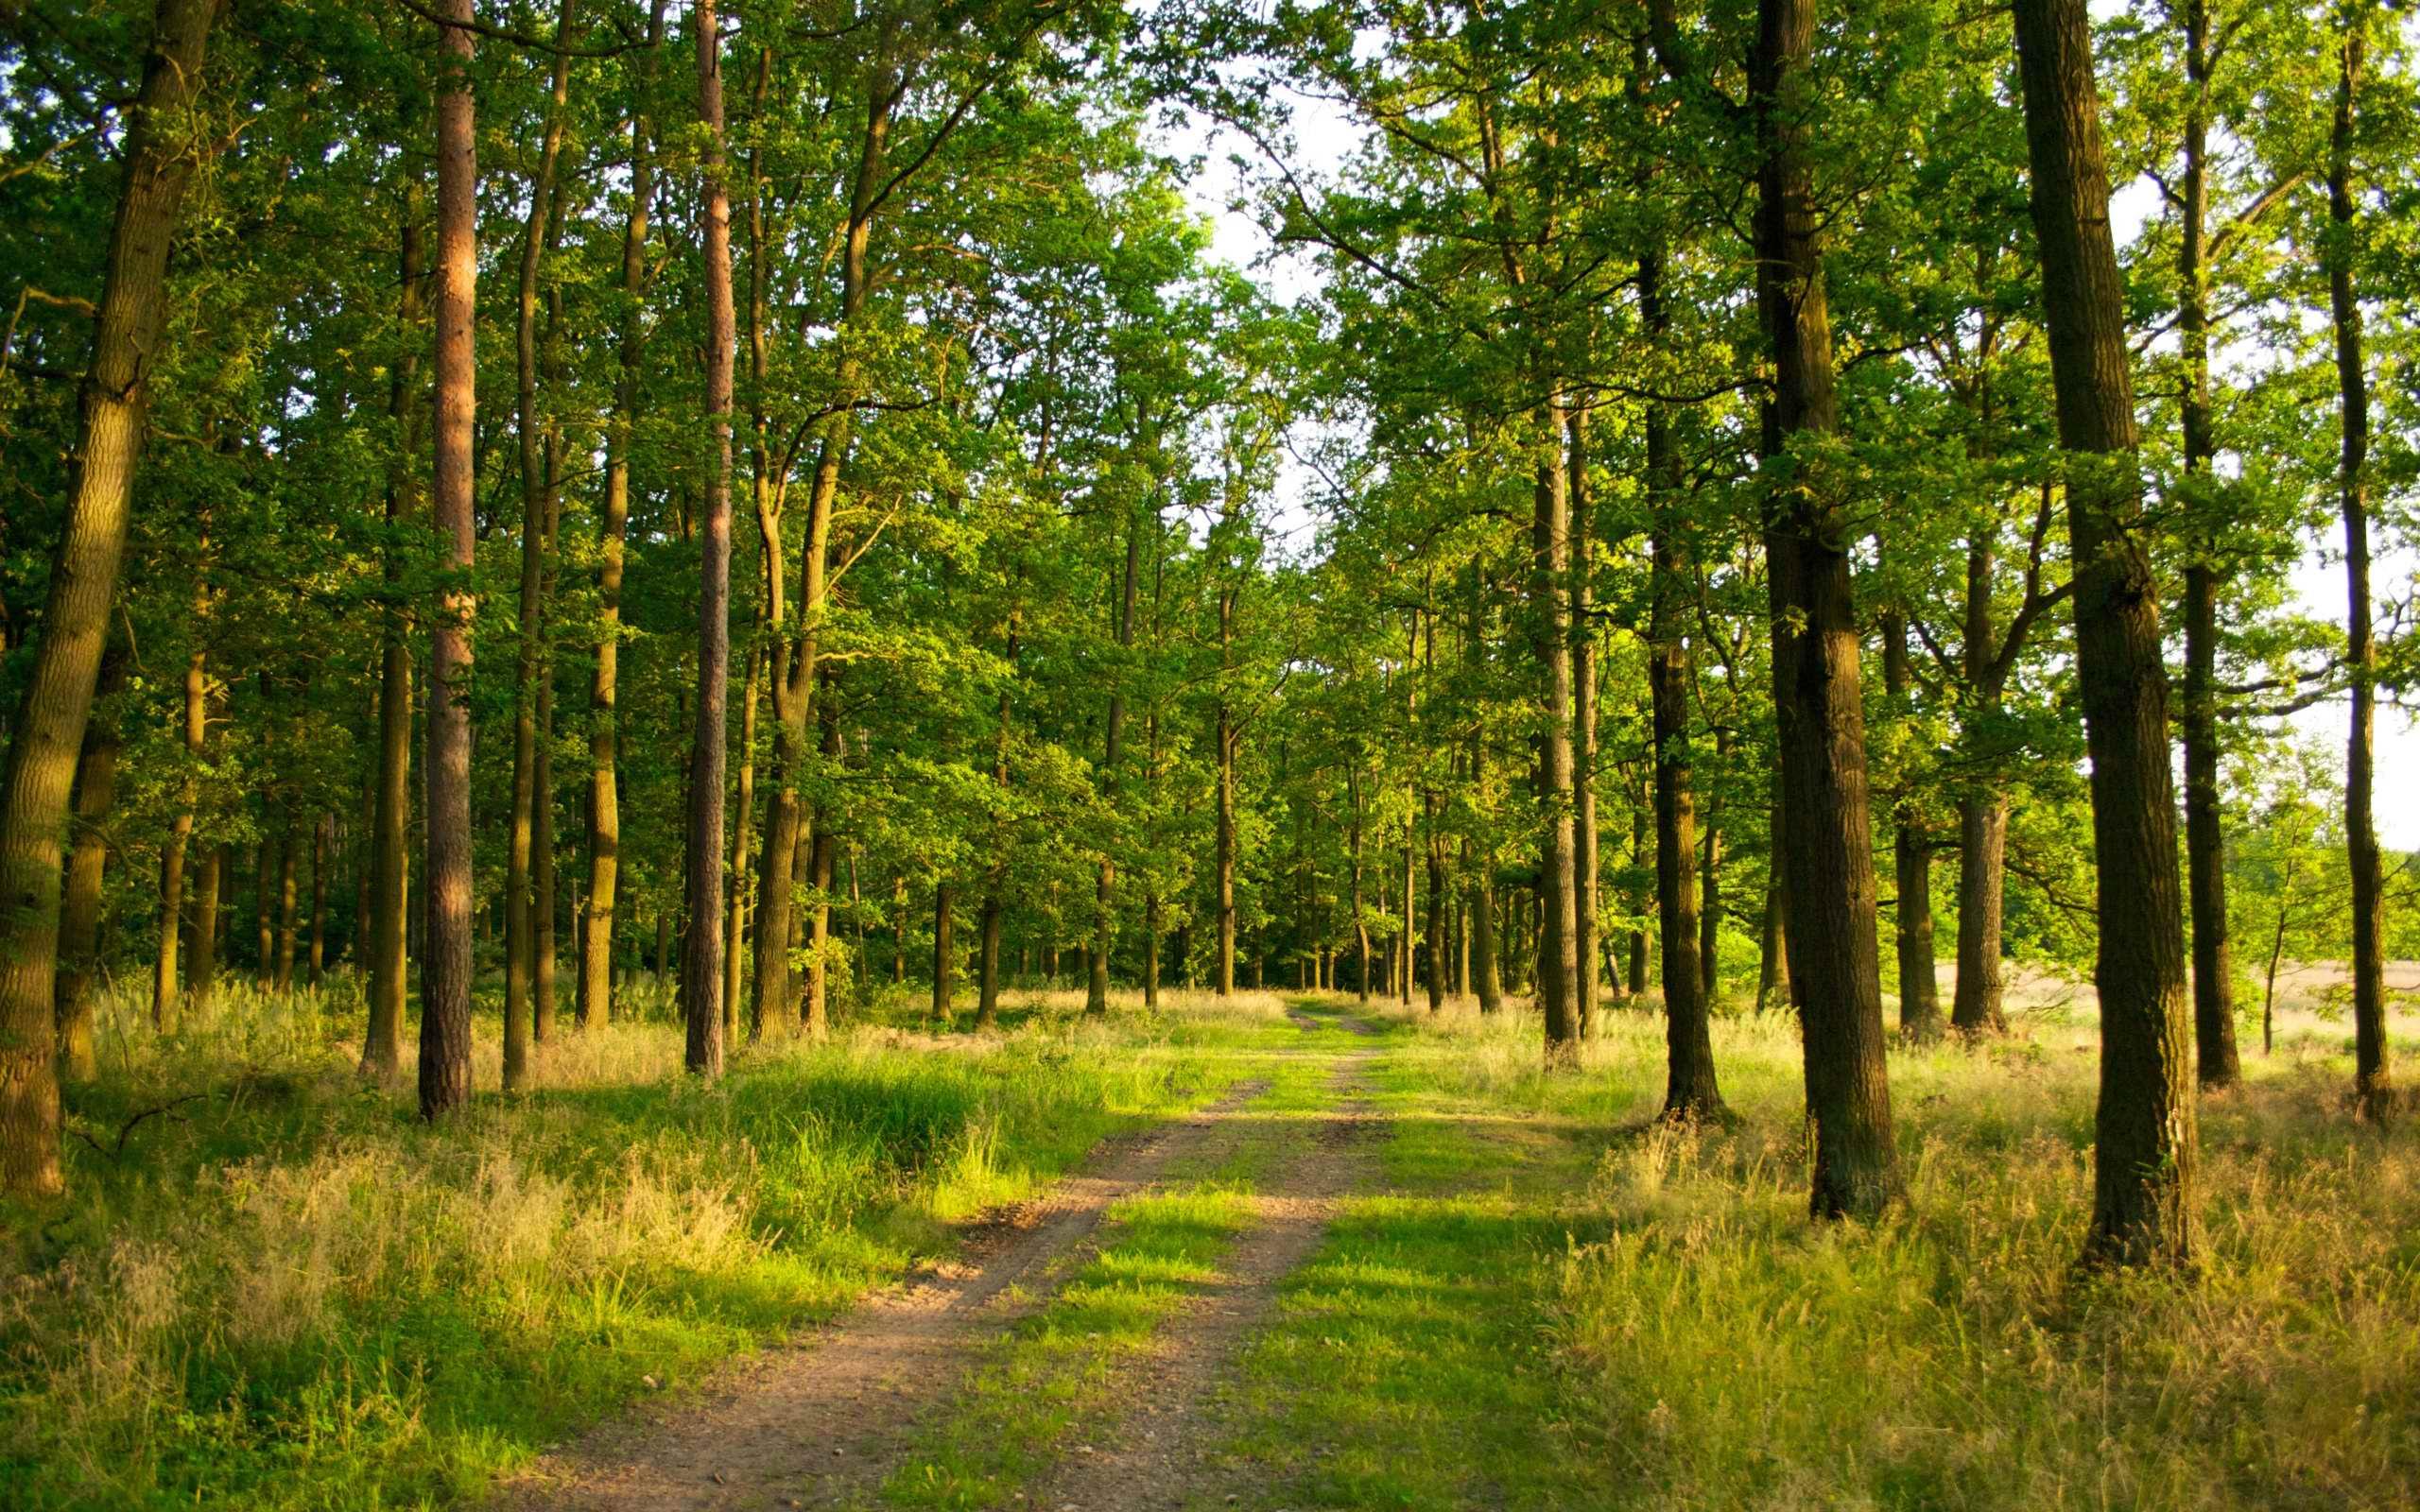 Forest Desktop Wallpapers Top Free Forest Desktop Backgrounds Wallpaperaccess